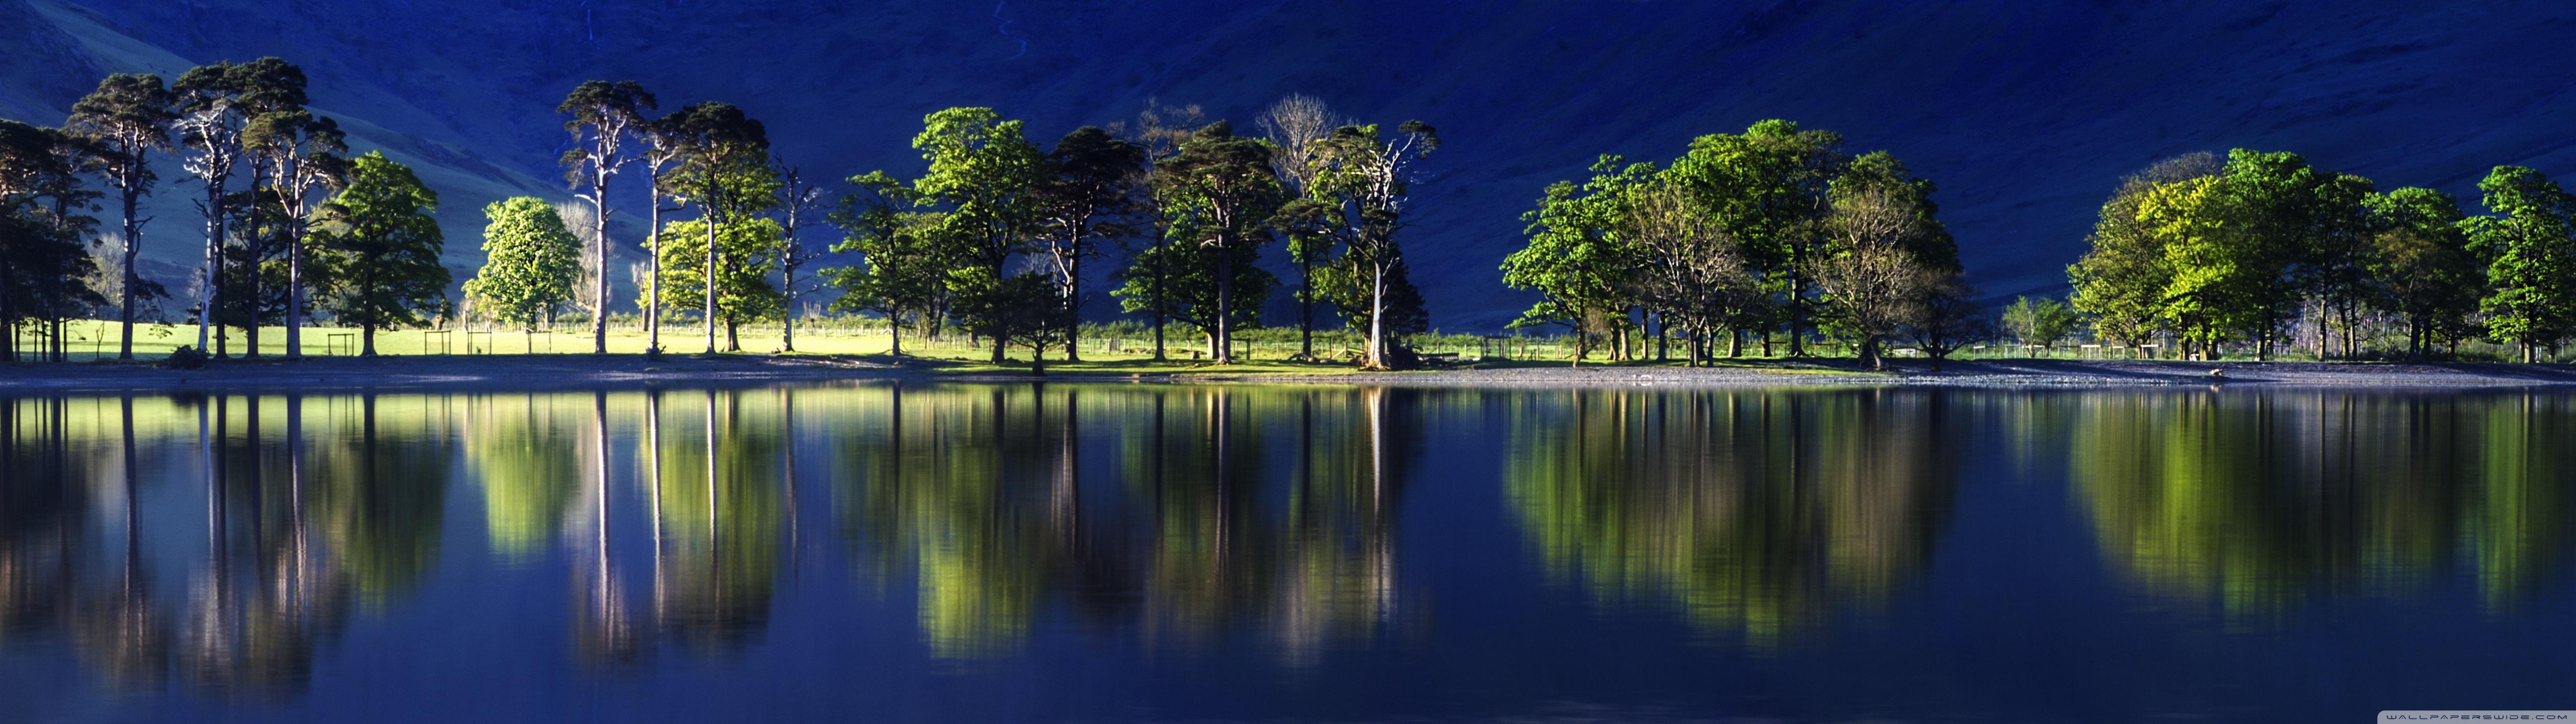 Download Free WallpaperBeatiful Reflection Blue Water Green Trees